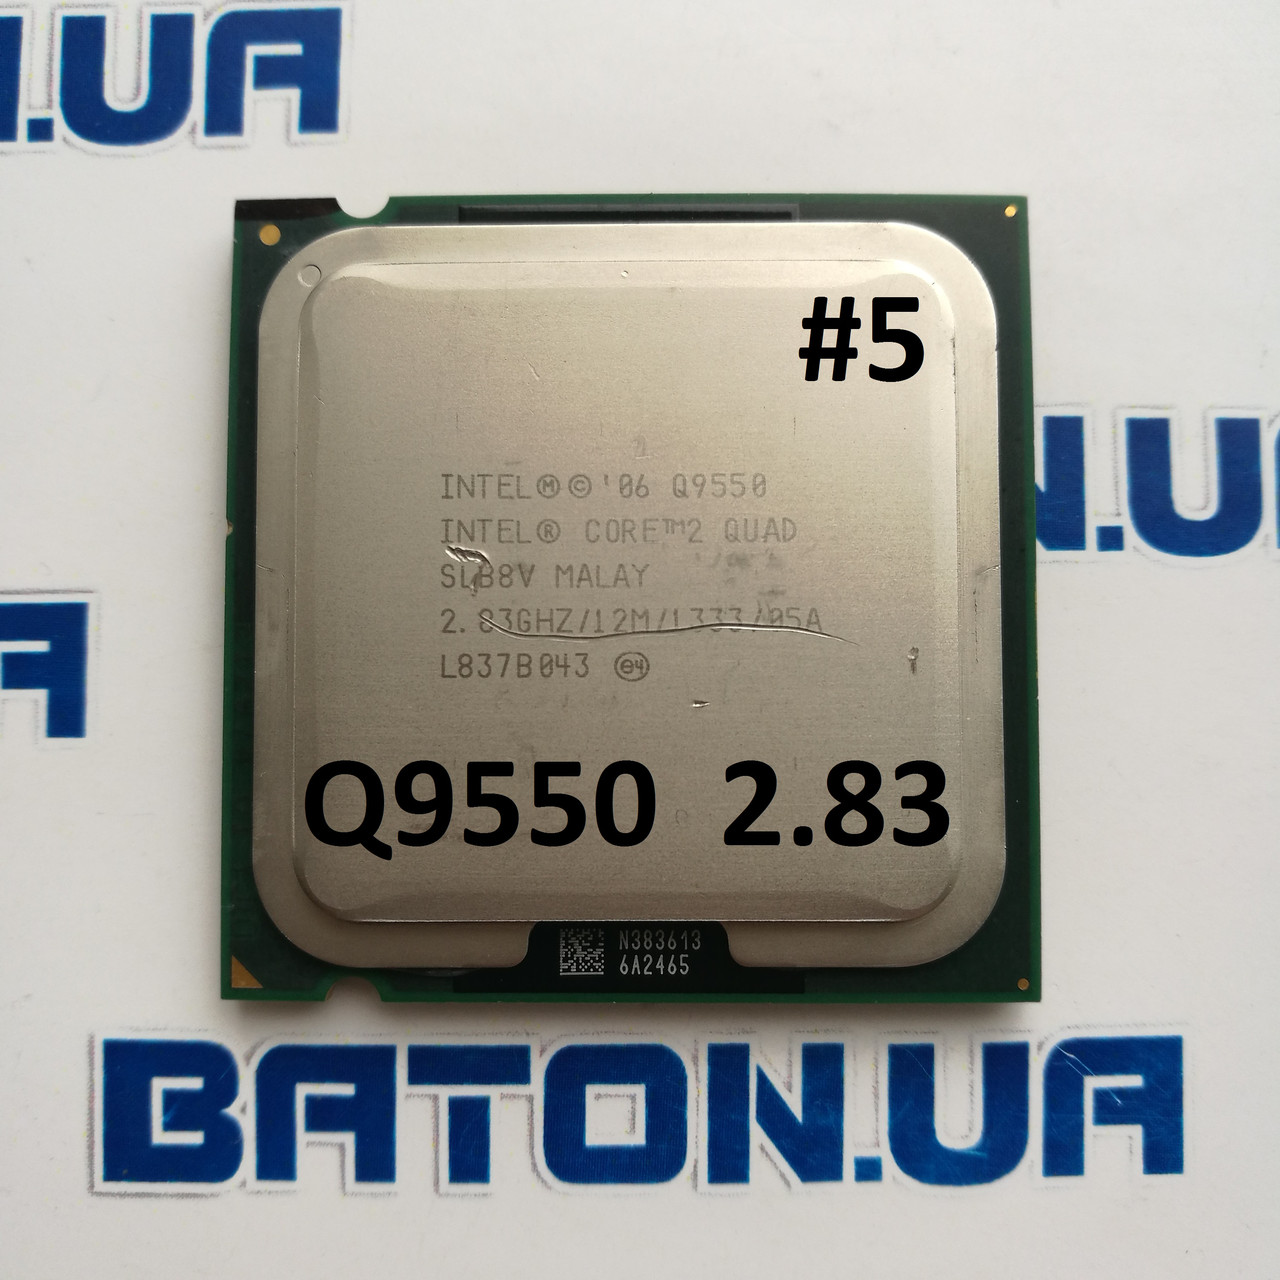 Процессор ЛОТ#5 Intel® Core™2 Quad Q9550 E0 SLB8V 2.83GHz 12M Cache 1333 MHz FSB Socket 775